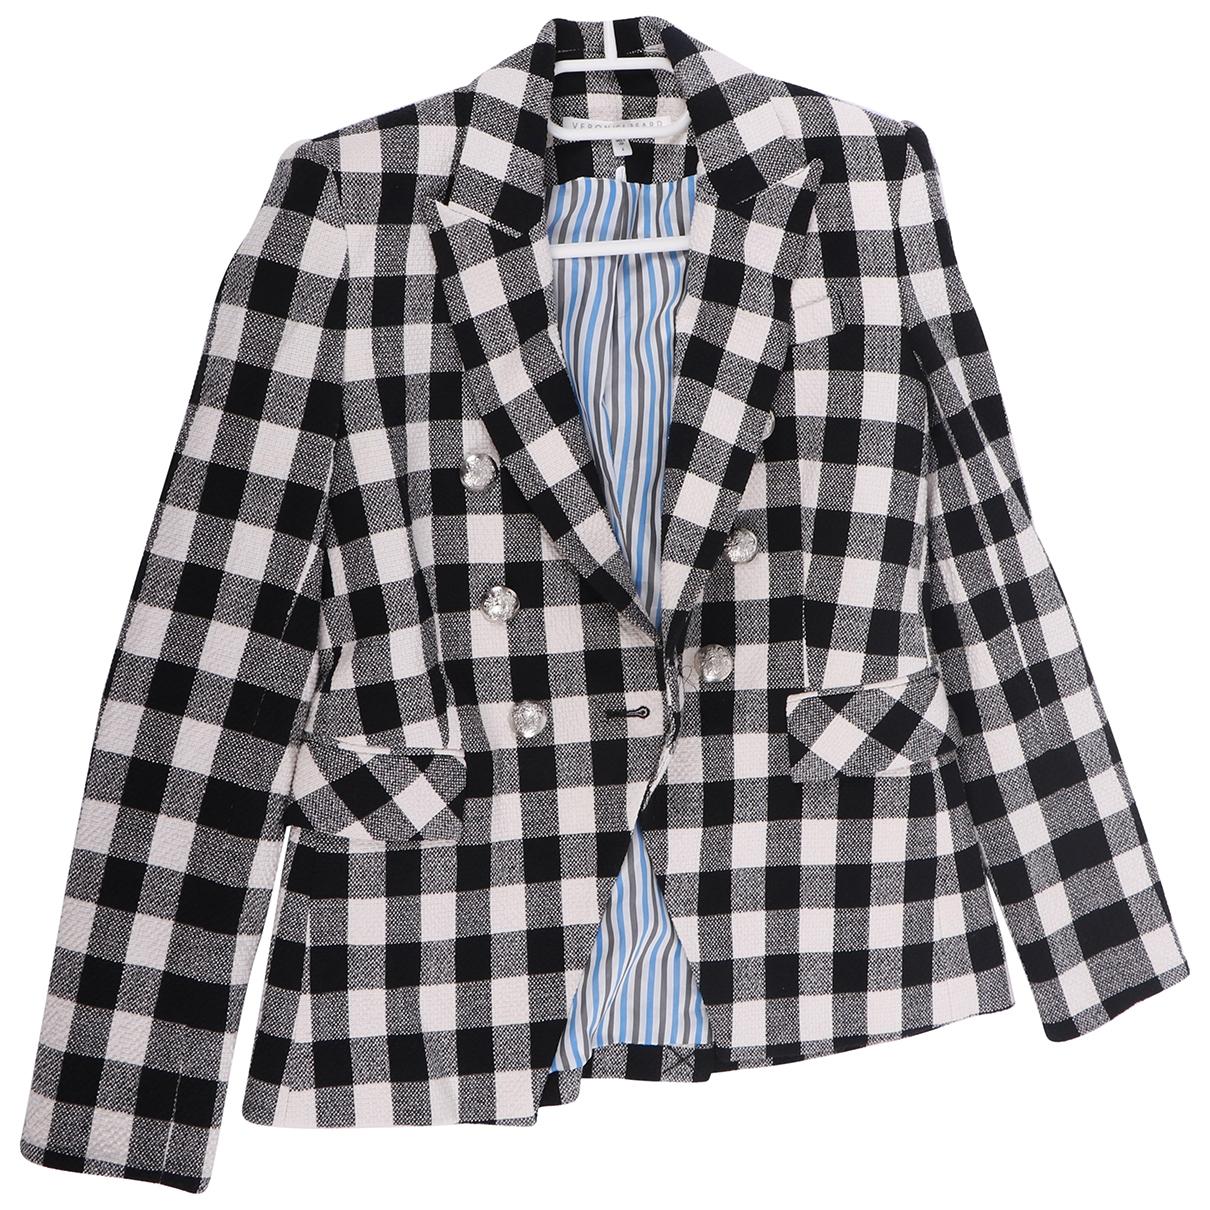 Veronica Beard \N Multicolour Linen jacket for Women 4 US